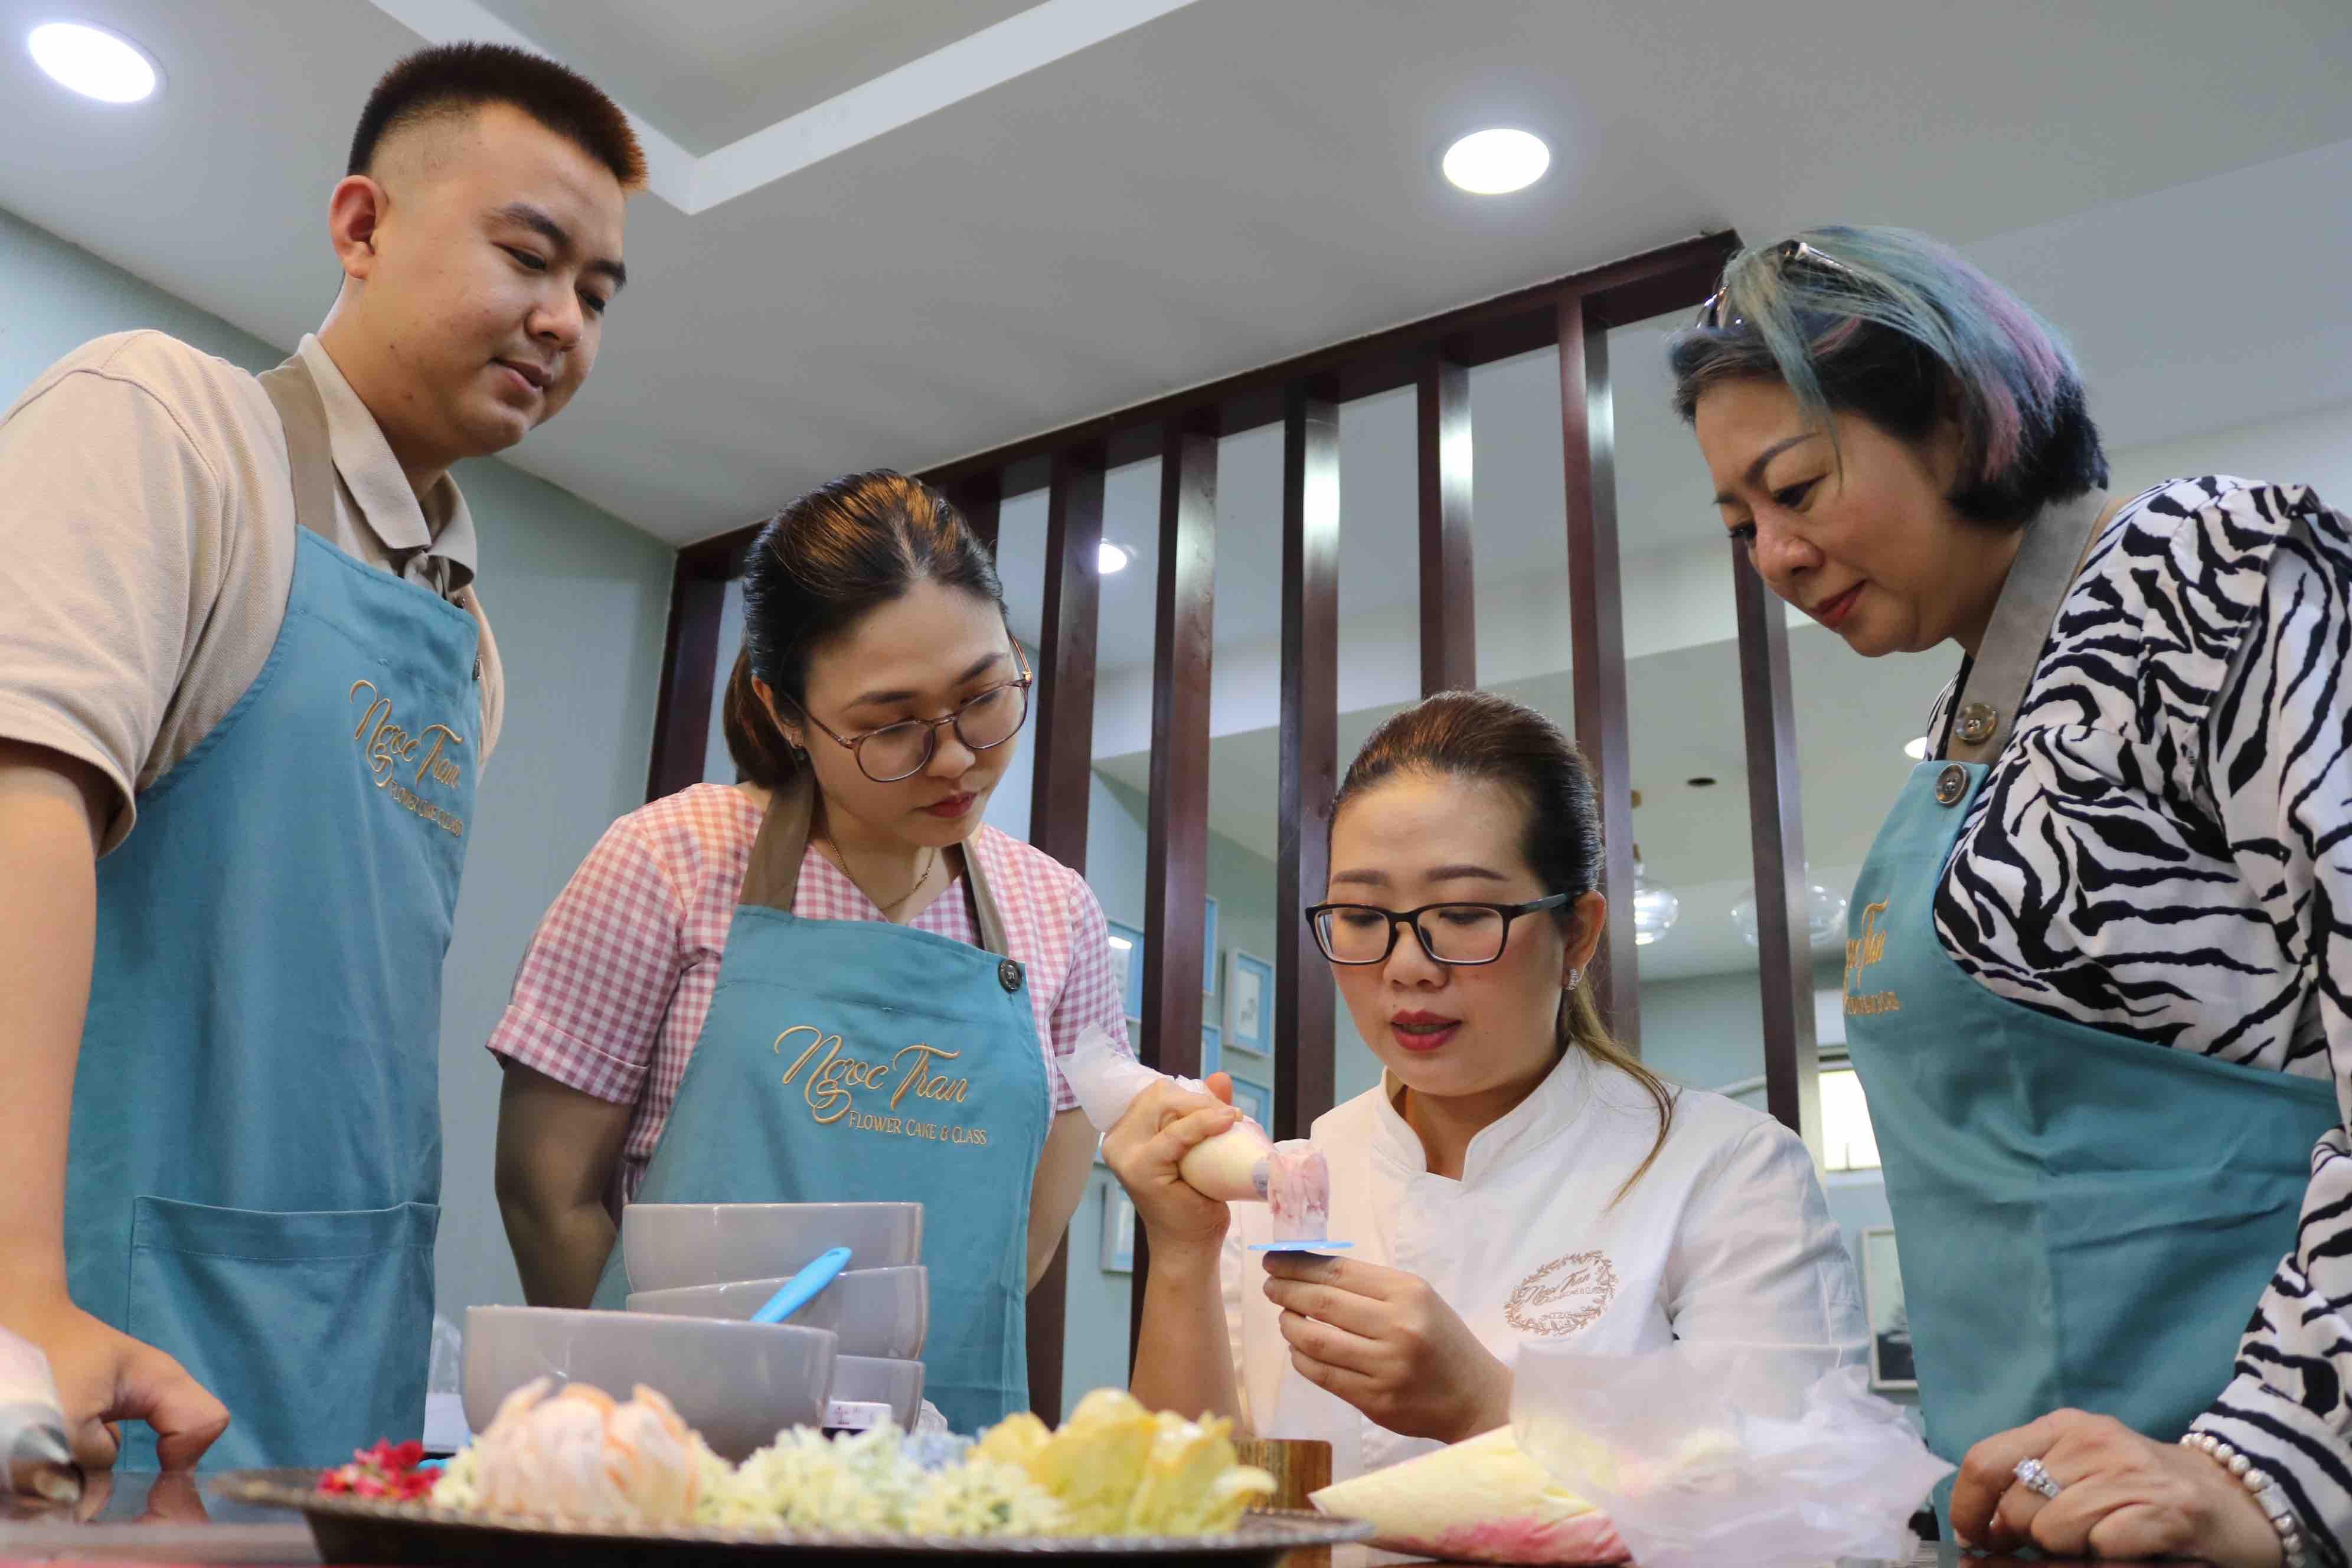 Lam Ngoc Tran teaches cake decorating at a workshop in Ho Chi Minh City. Photo: Hoang An / Tuoi Tre